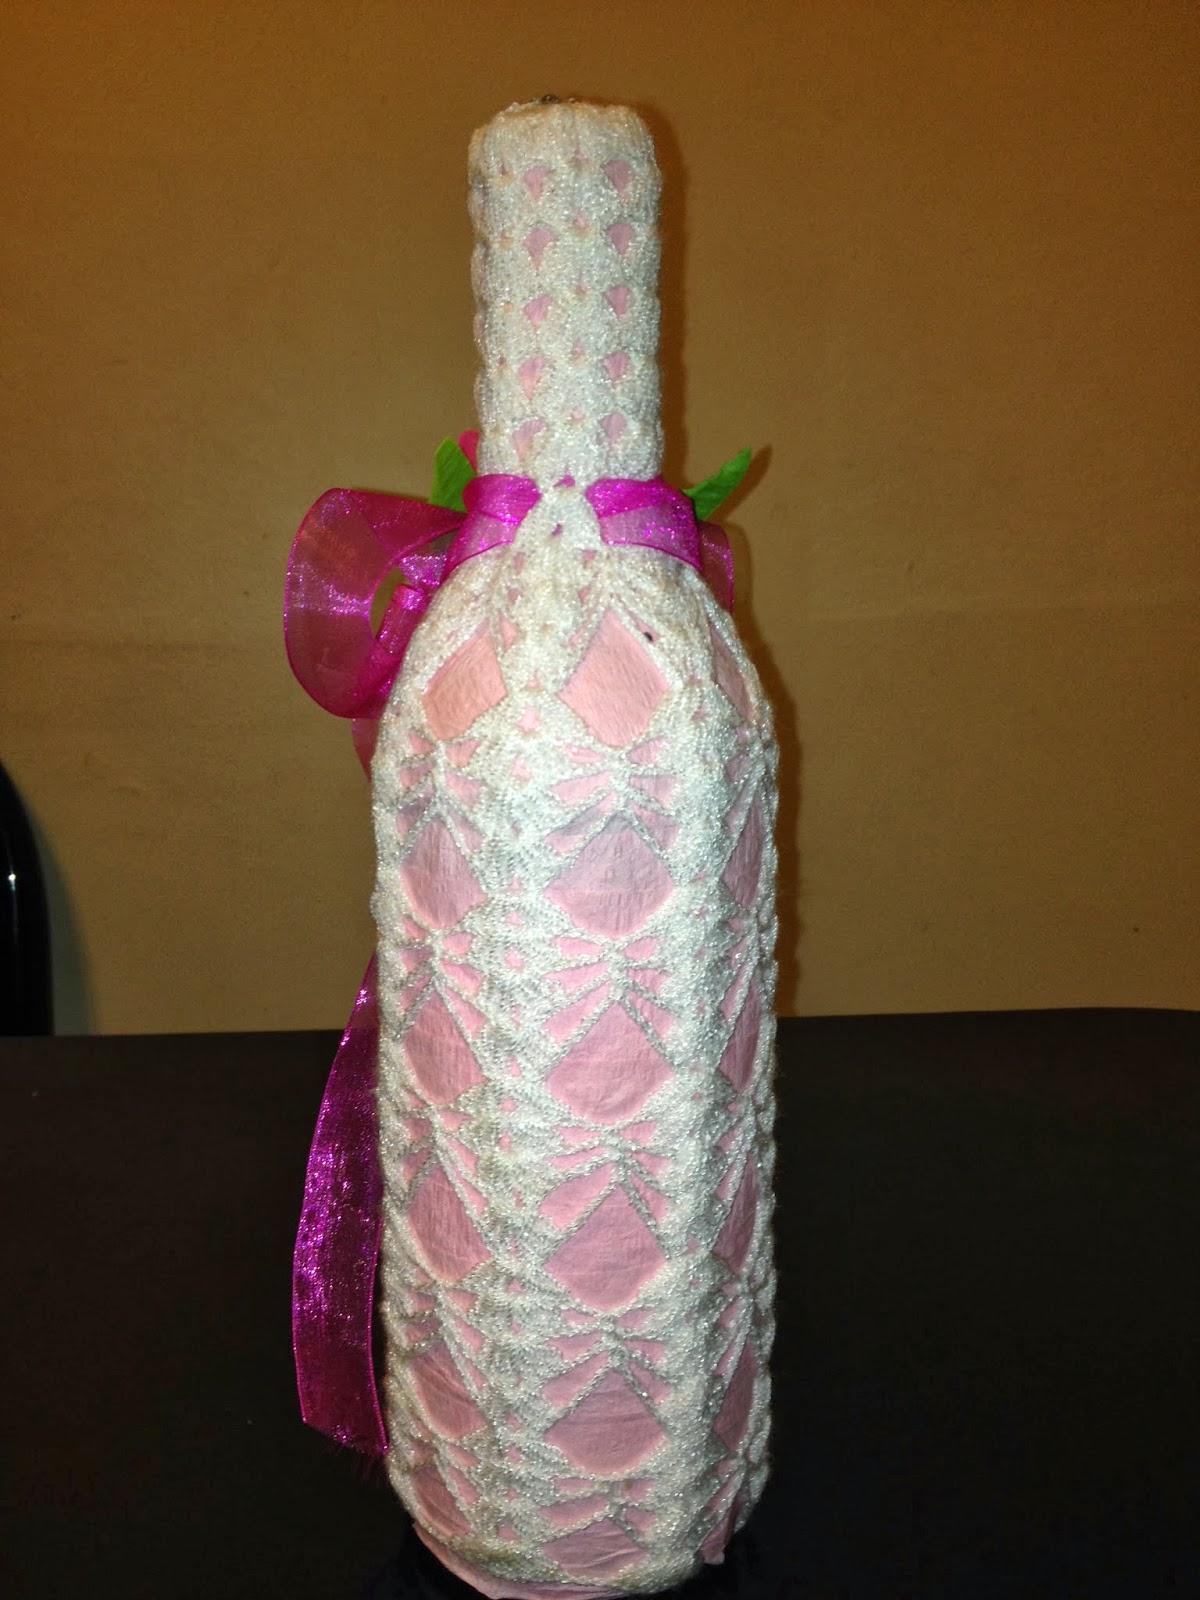 Hogar crochet moda maquillaje y peinados vestido para for Decoracion hogar a crochet